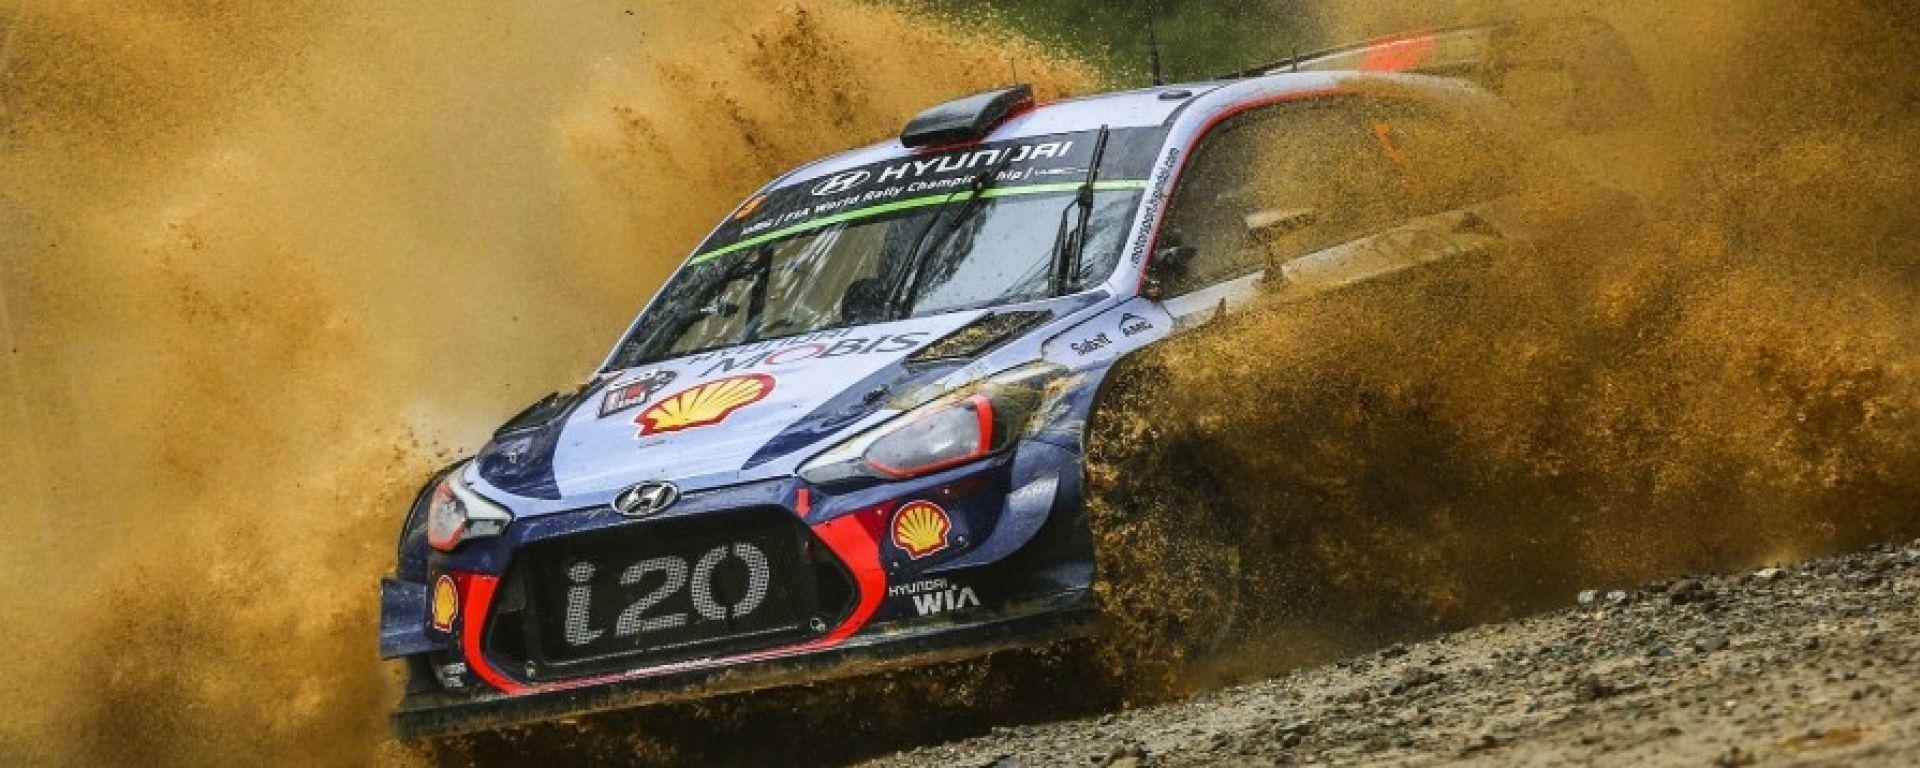 Hyundai Motorsport - WRC 2018